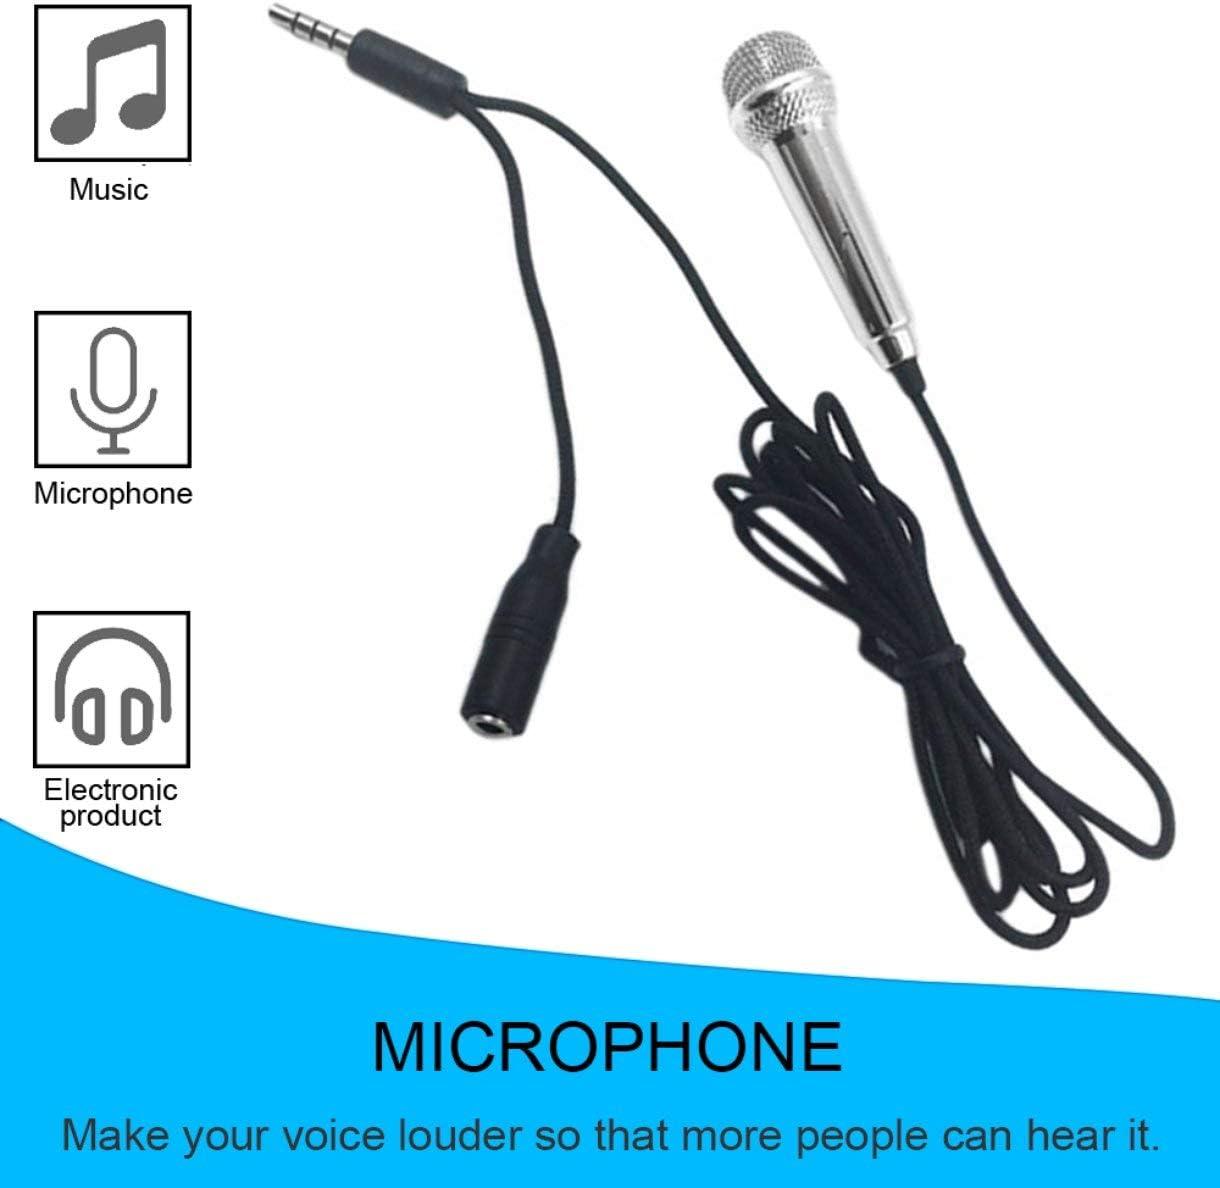 Tragbare aluminiumlegierung mini 3,5mm kabelgebundenes mikrofon f/ür handy tablet pc laptop rede singen karaoke f/ür iphone farbe: silber